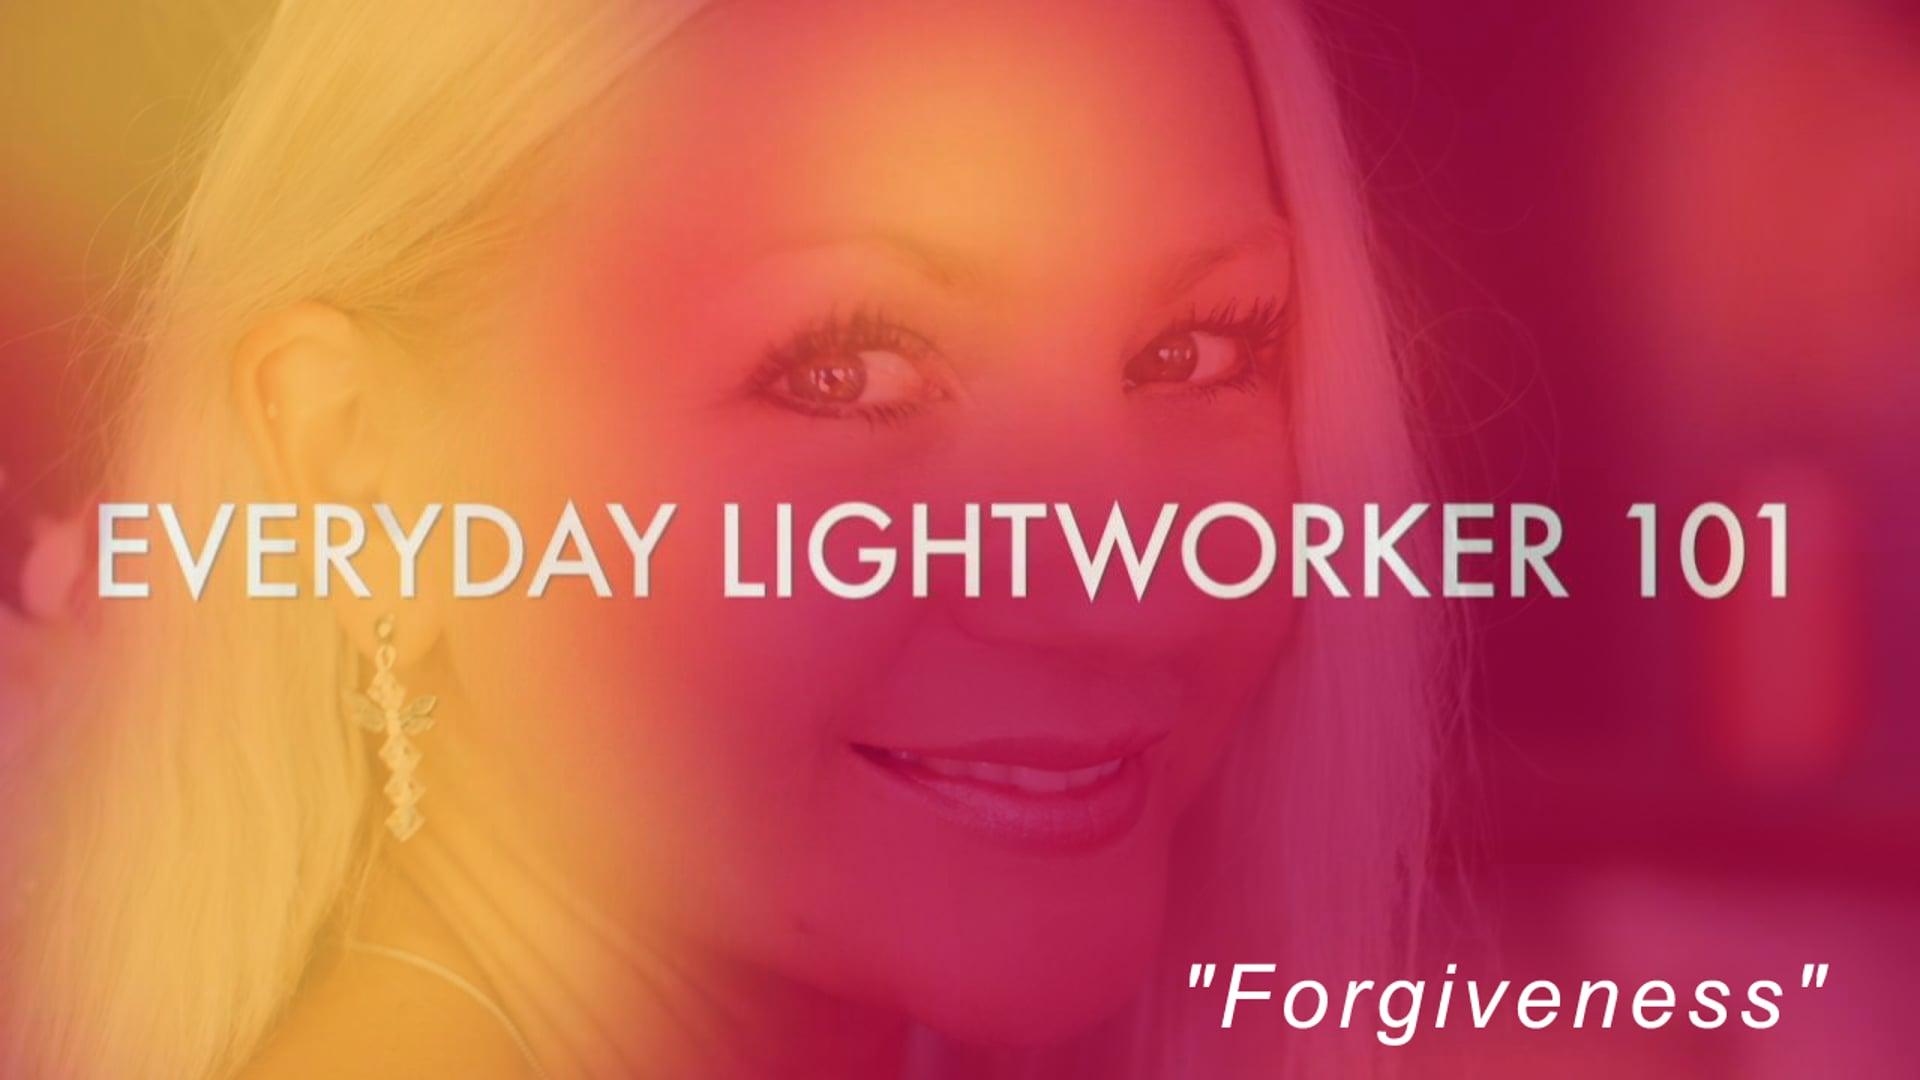 Everyday Lightworker 101: Forgiveness